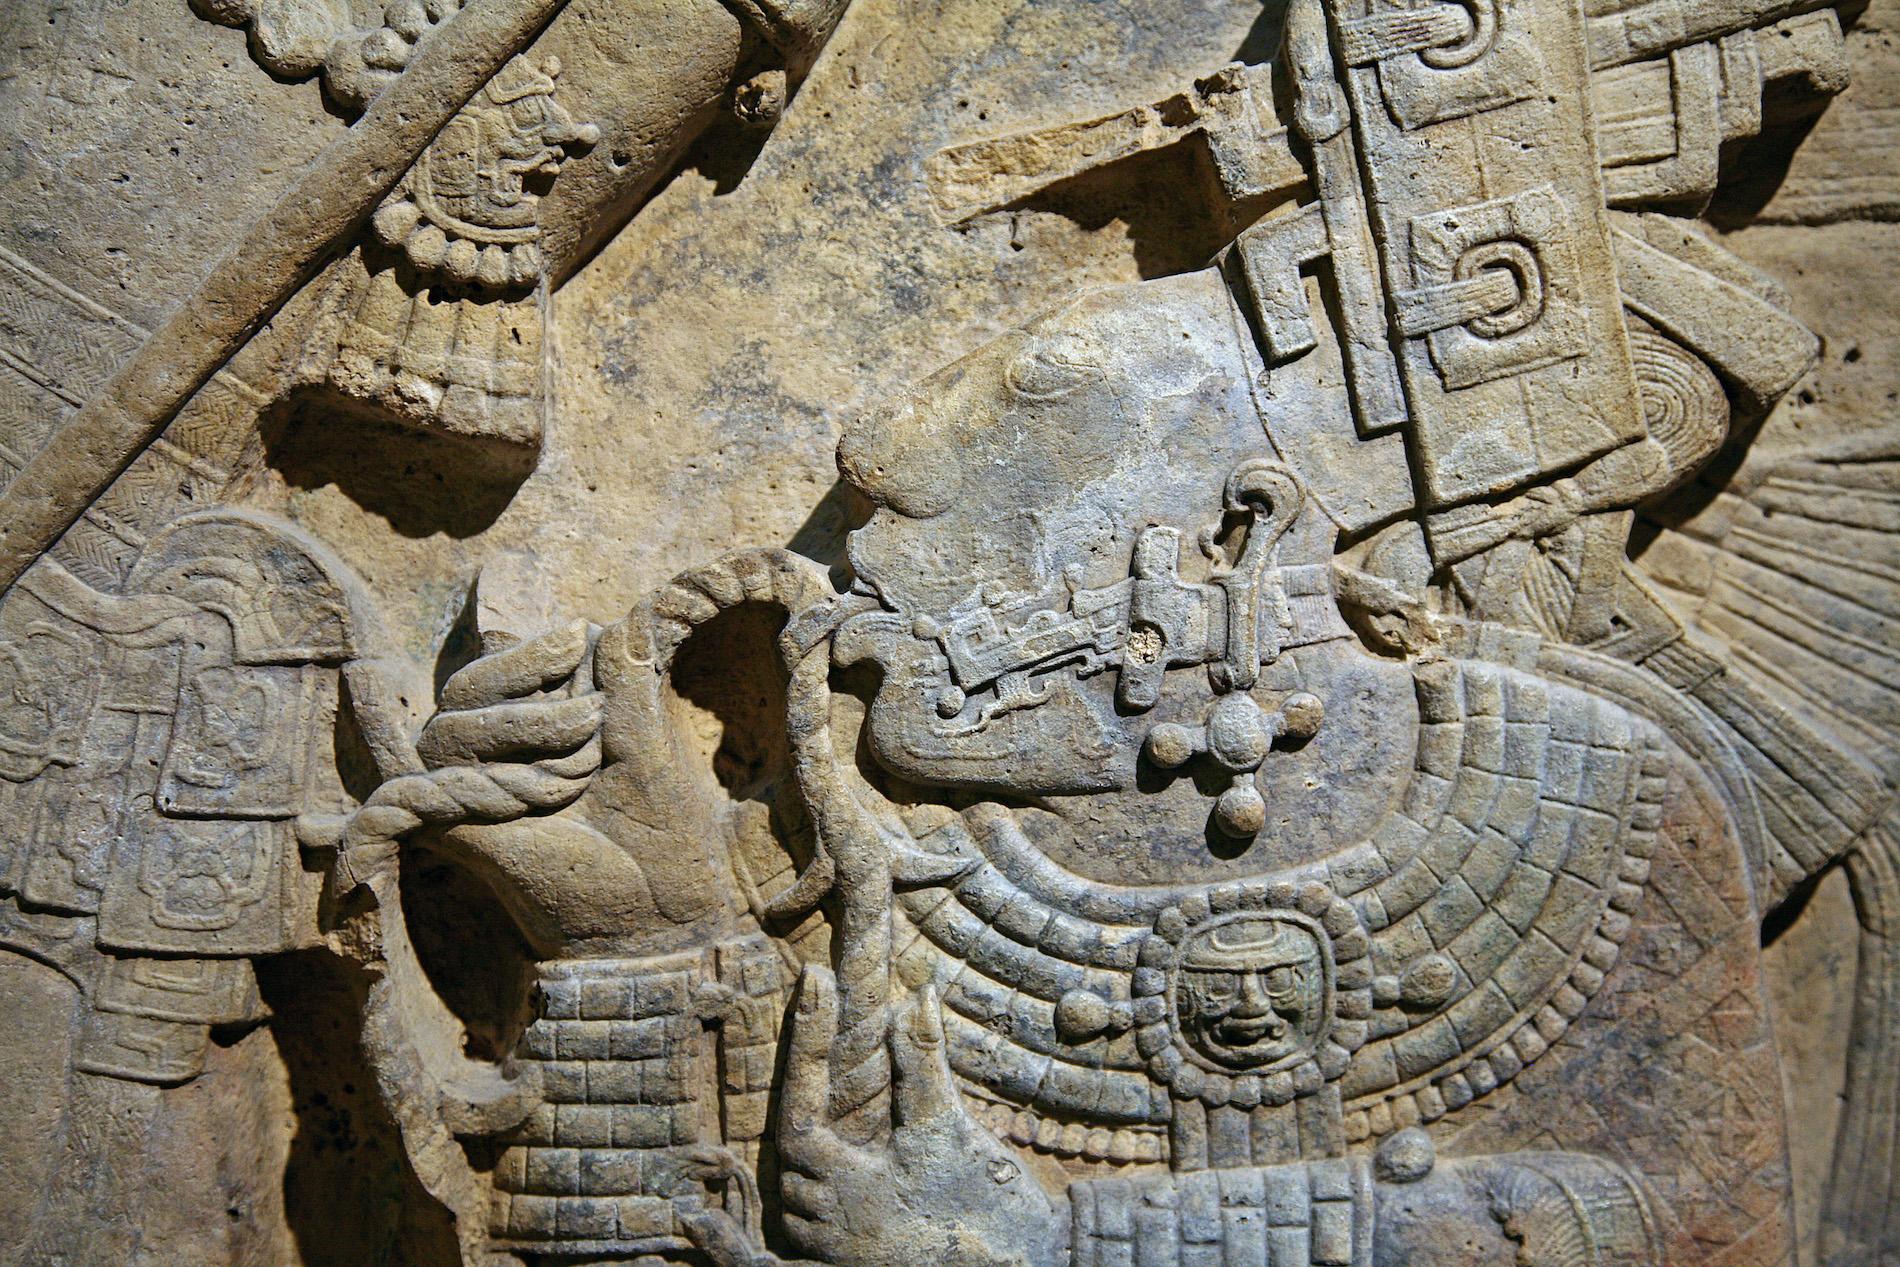 dessin-communauté-maya-murs-yaxchilan